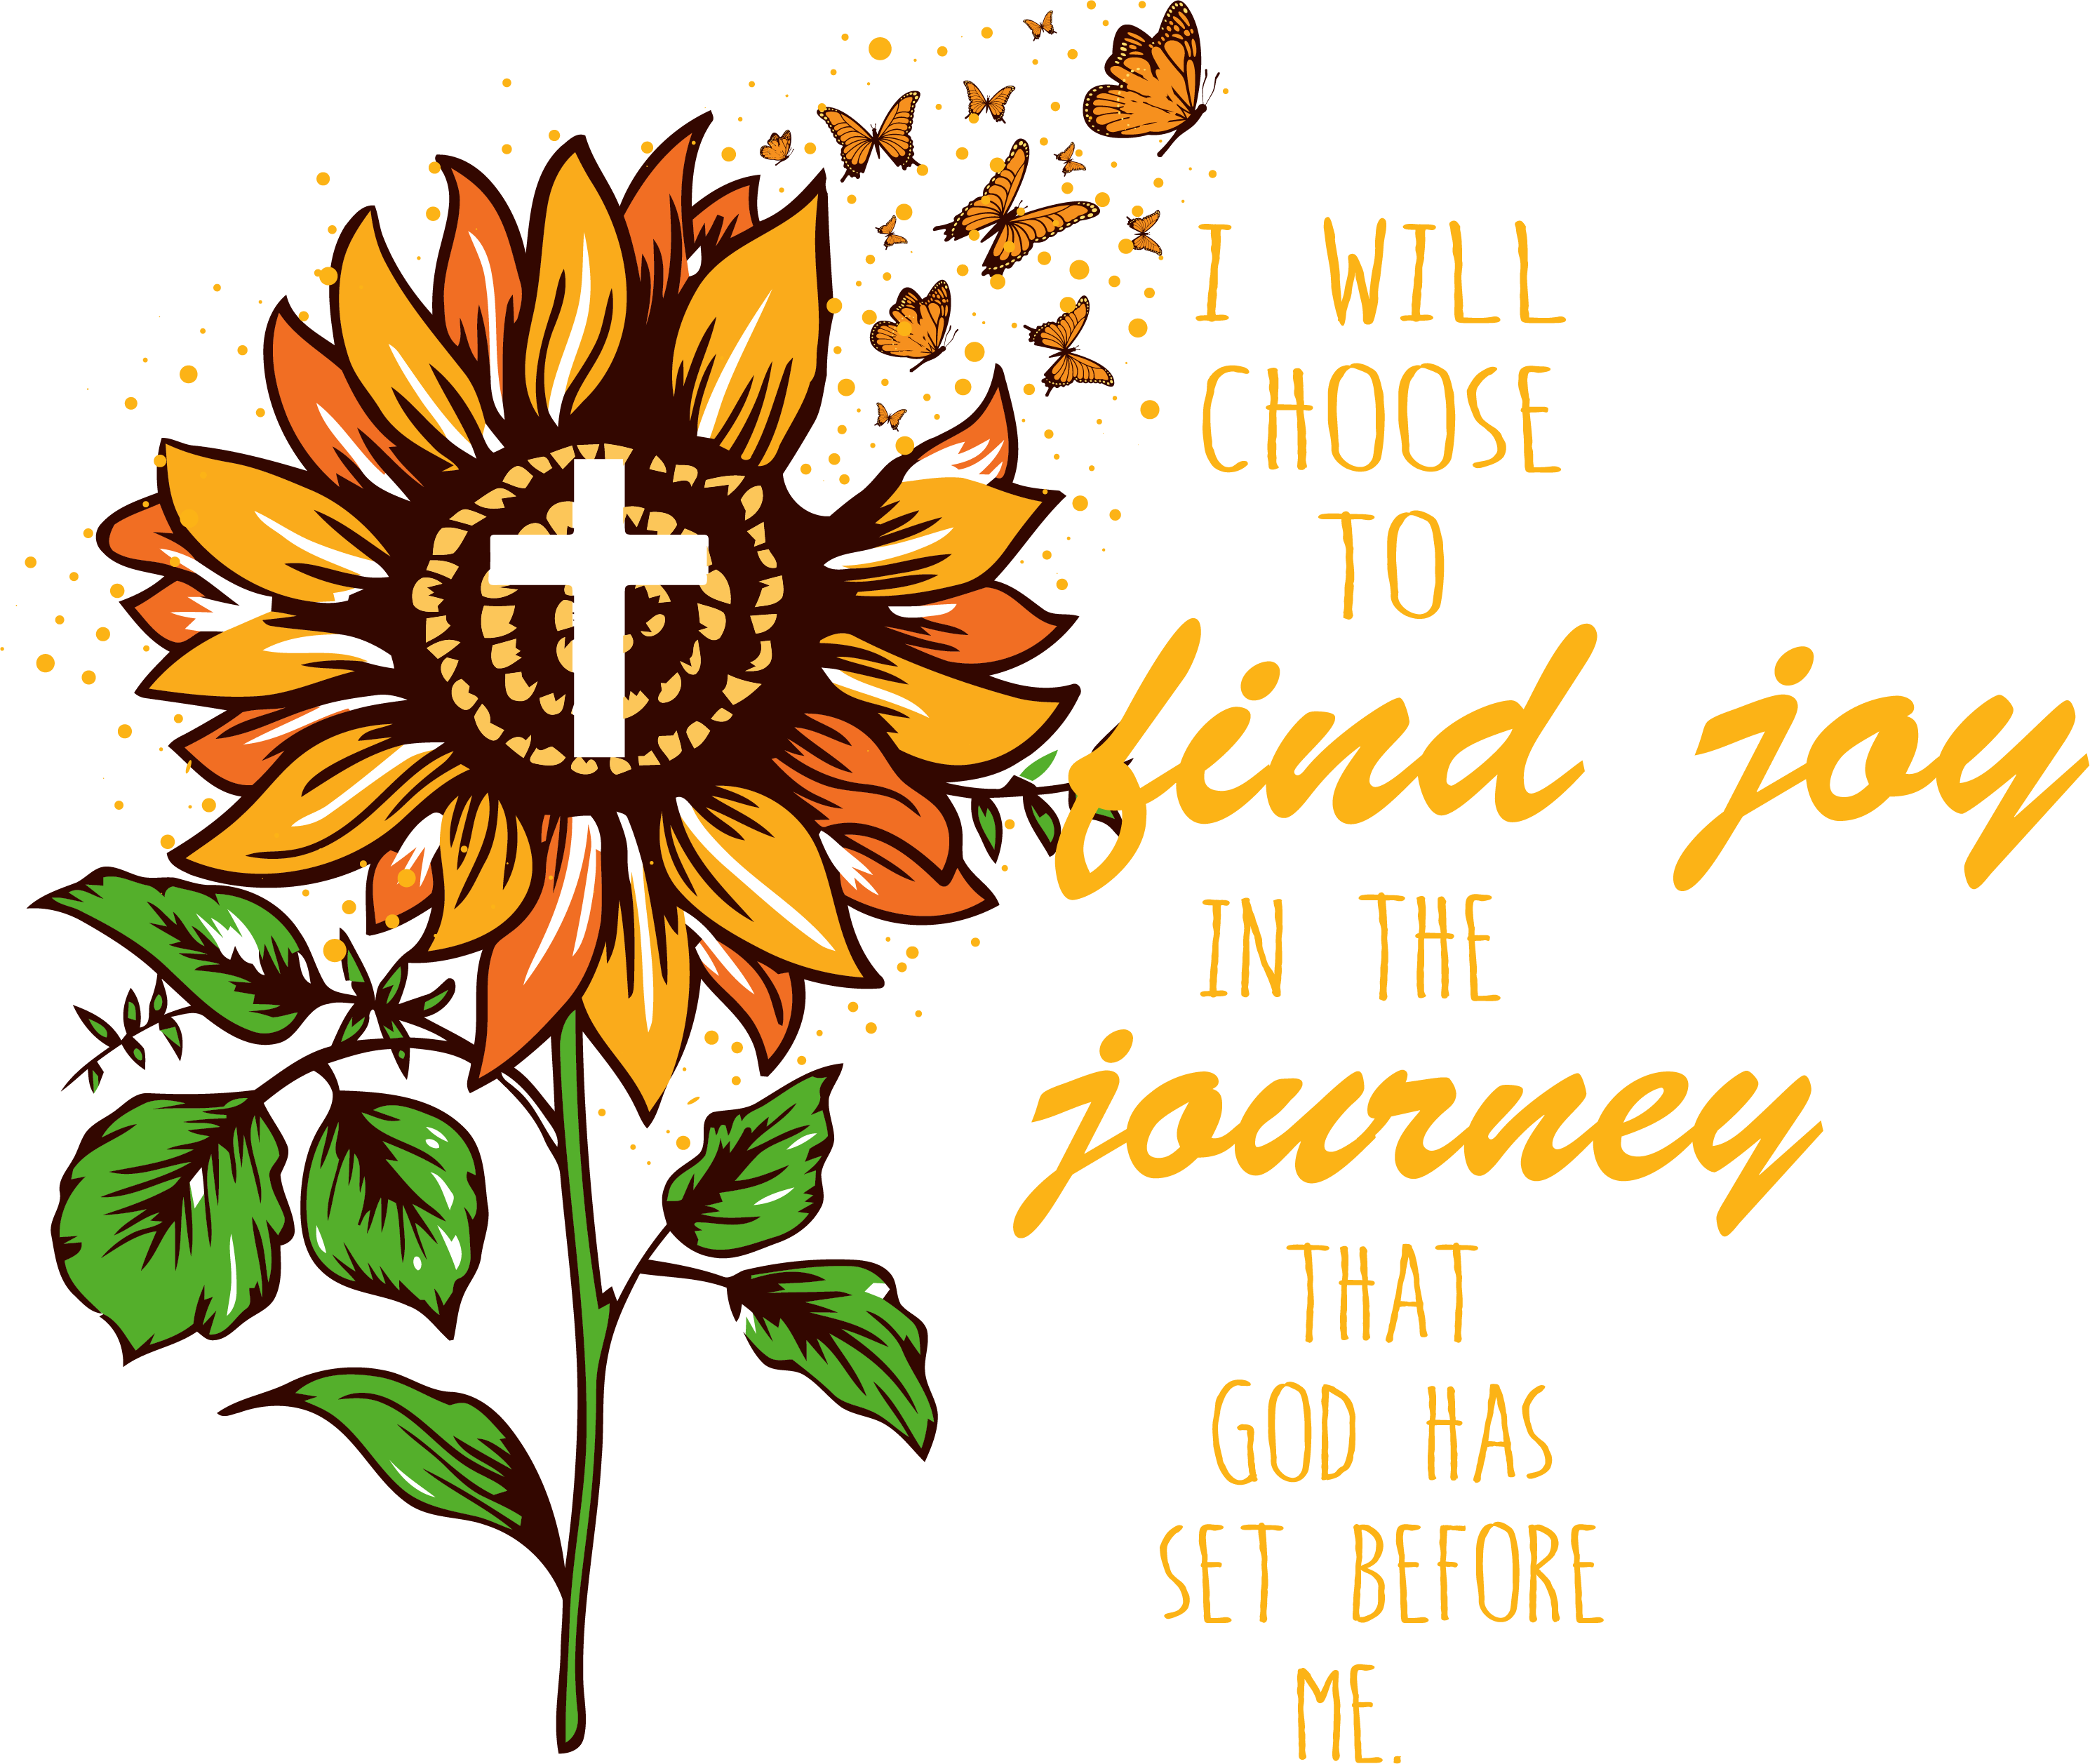 I will choose to find joy, sunflower svg, faith hope love.